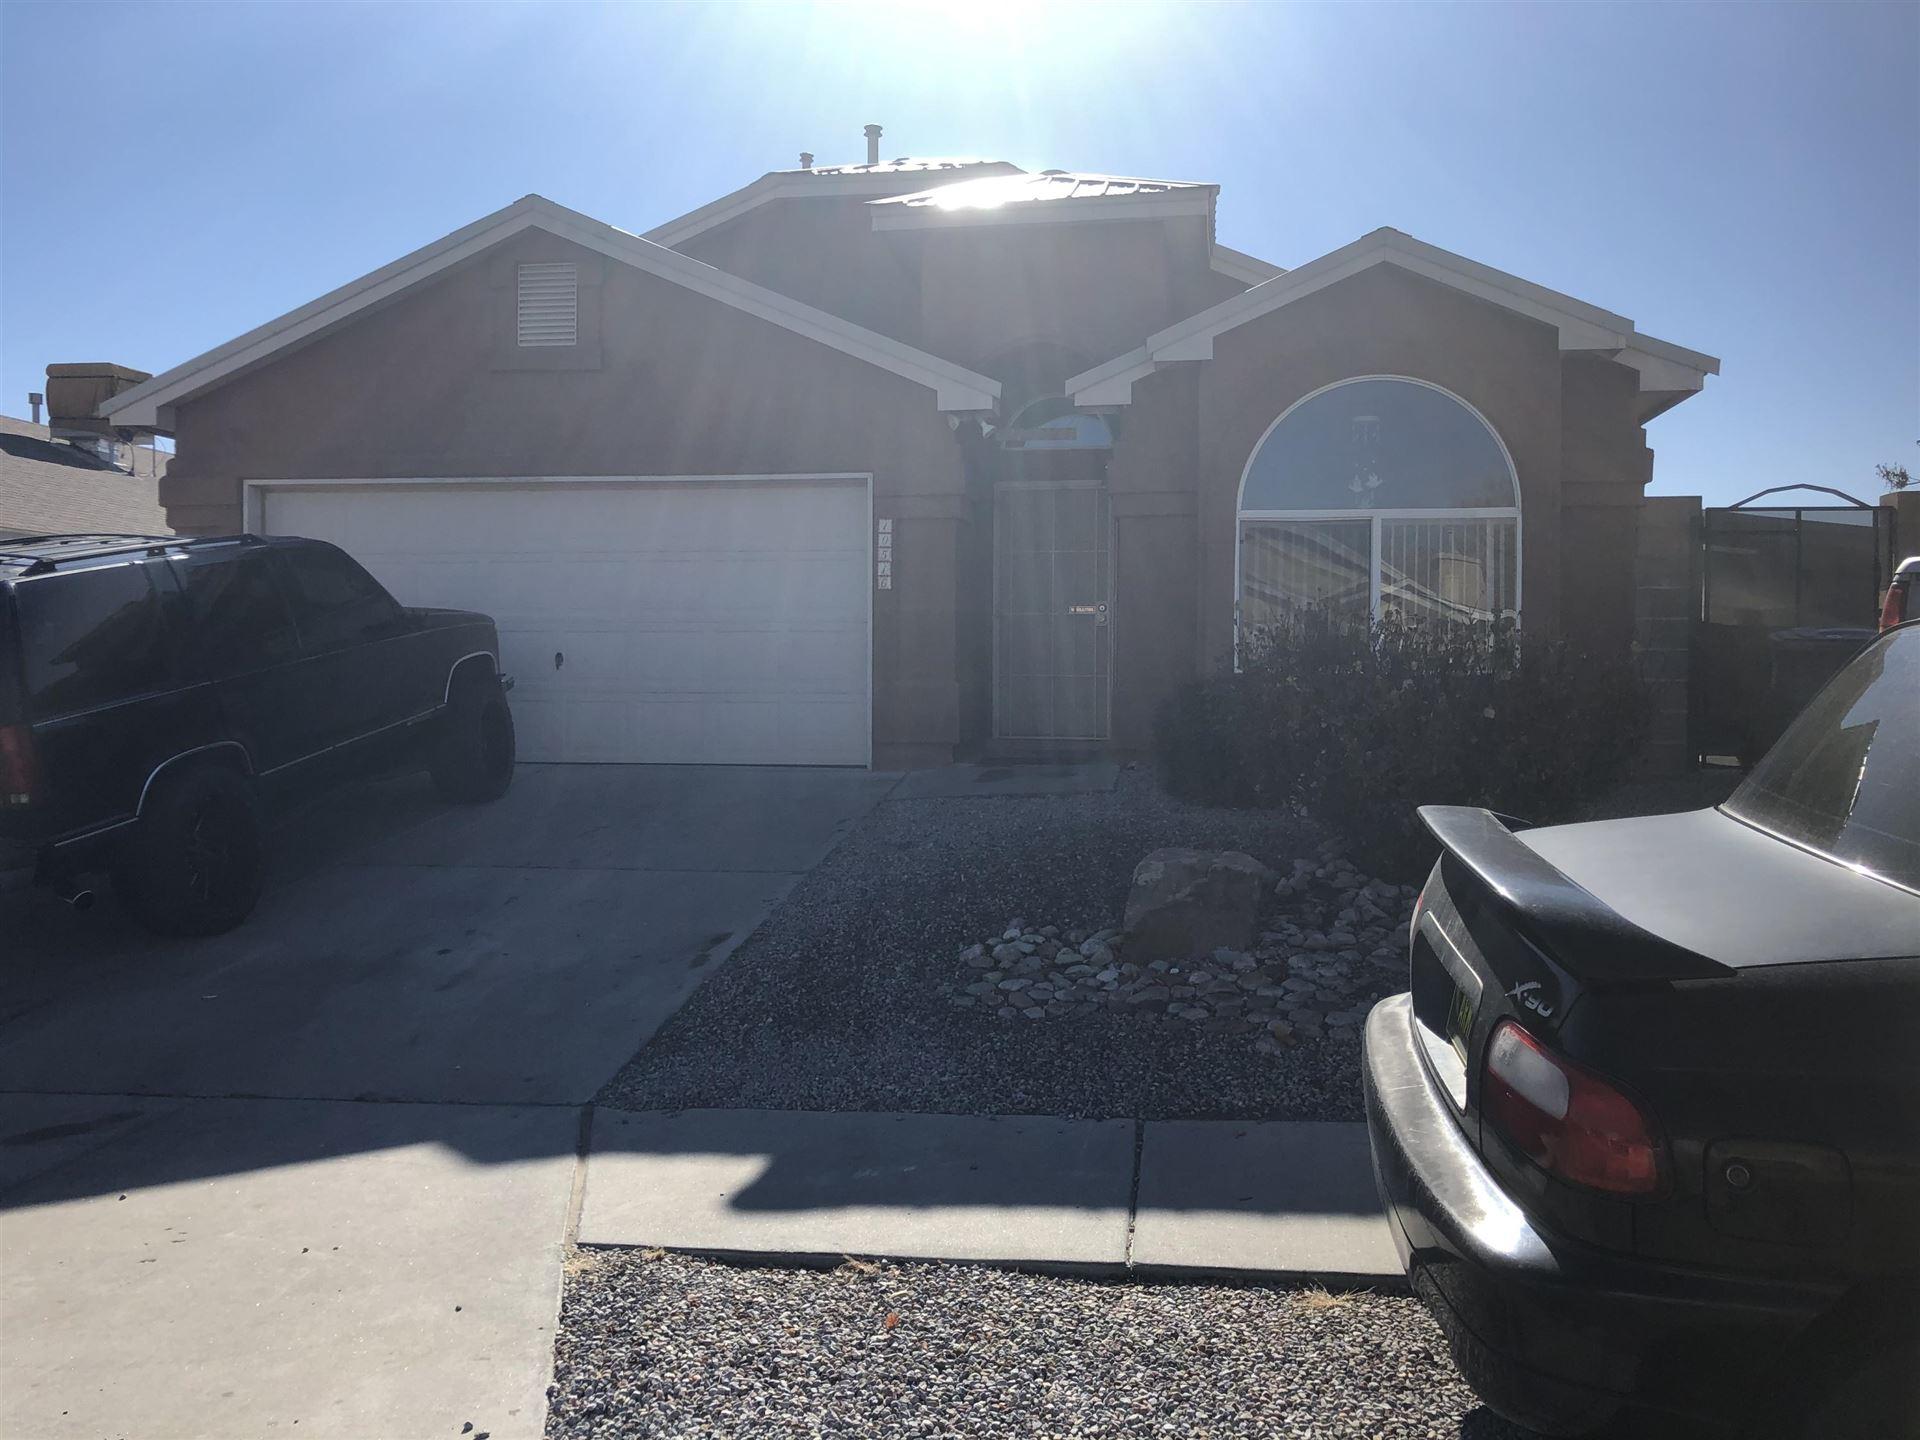 10516 PASO FINO Place SW, Albuquerque, NM 87121 - MLS#: 984260